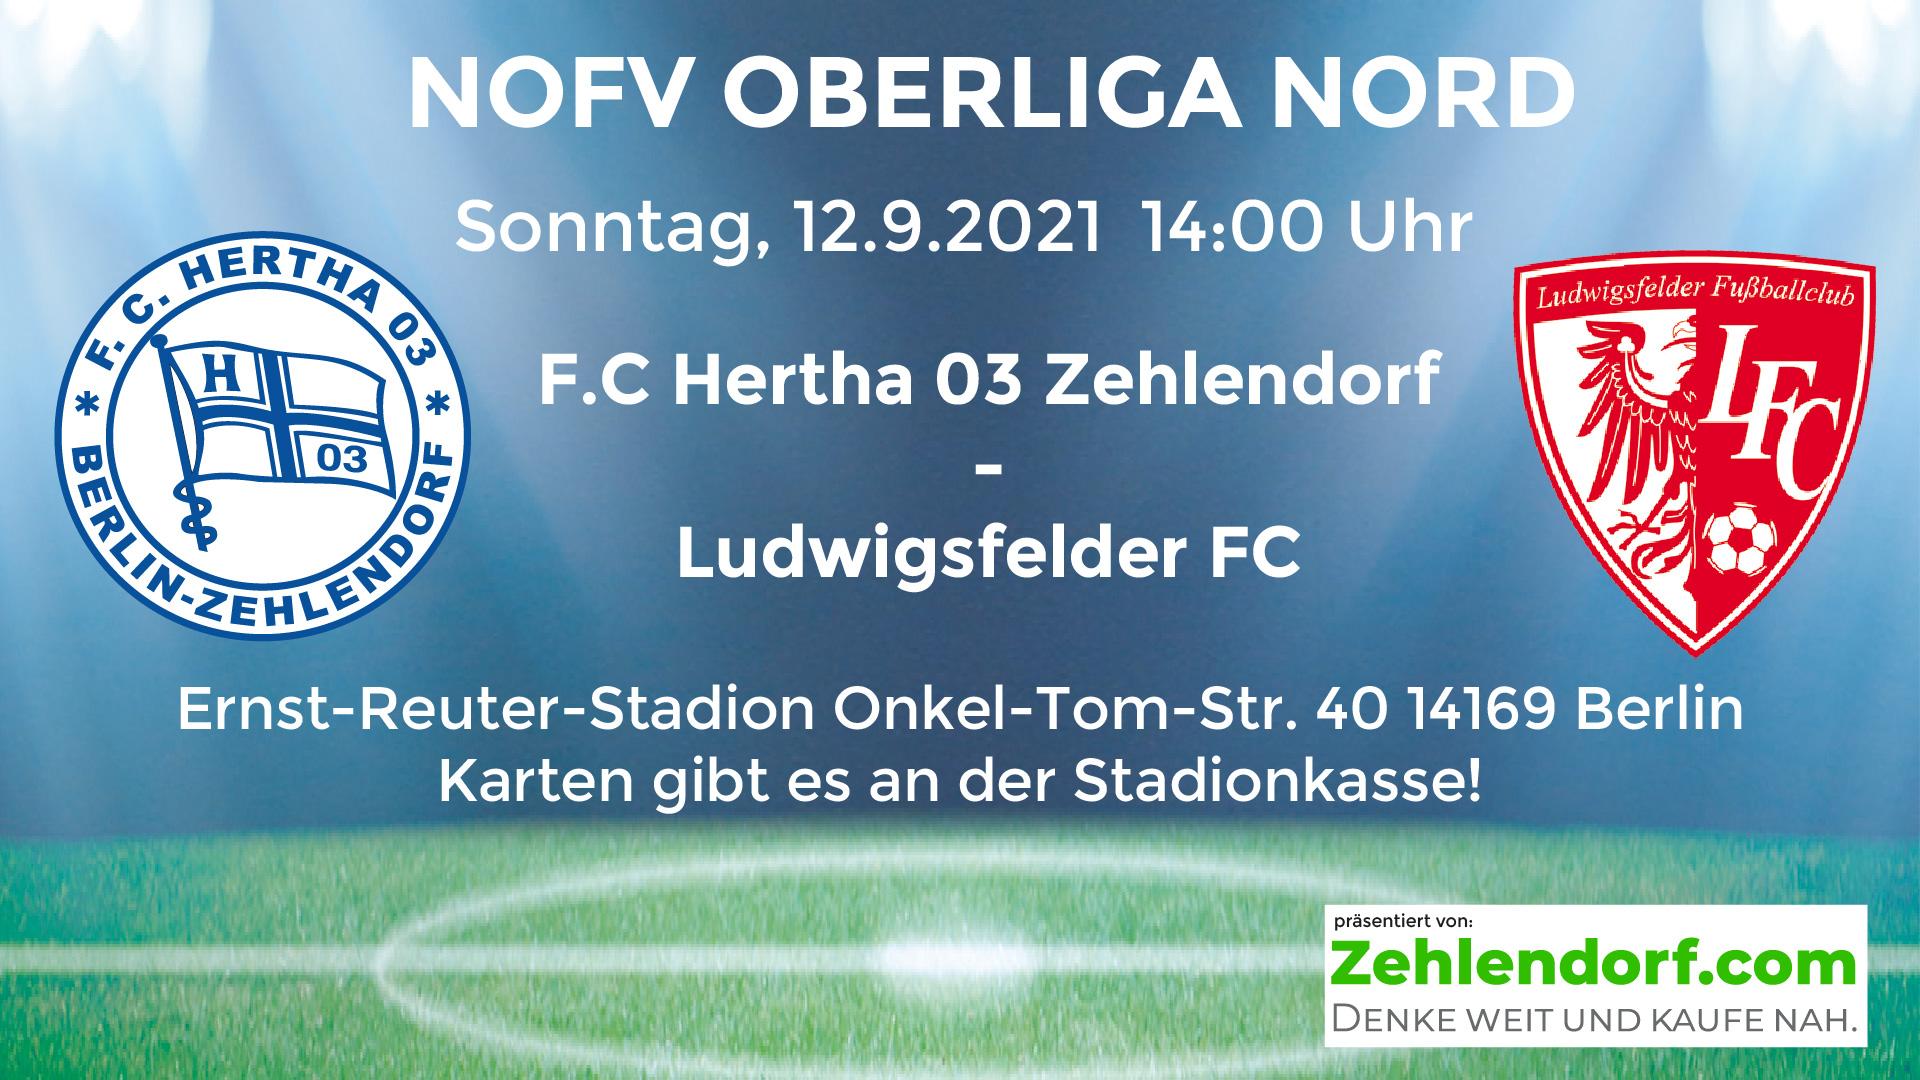 F.C. Hertha 03 Zehlendorf vs. Ludwigsfelder F.C. am 12.9.2021